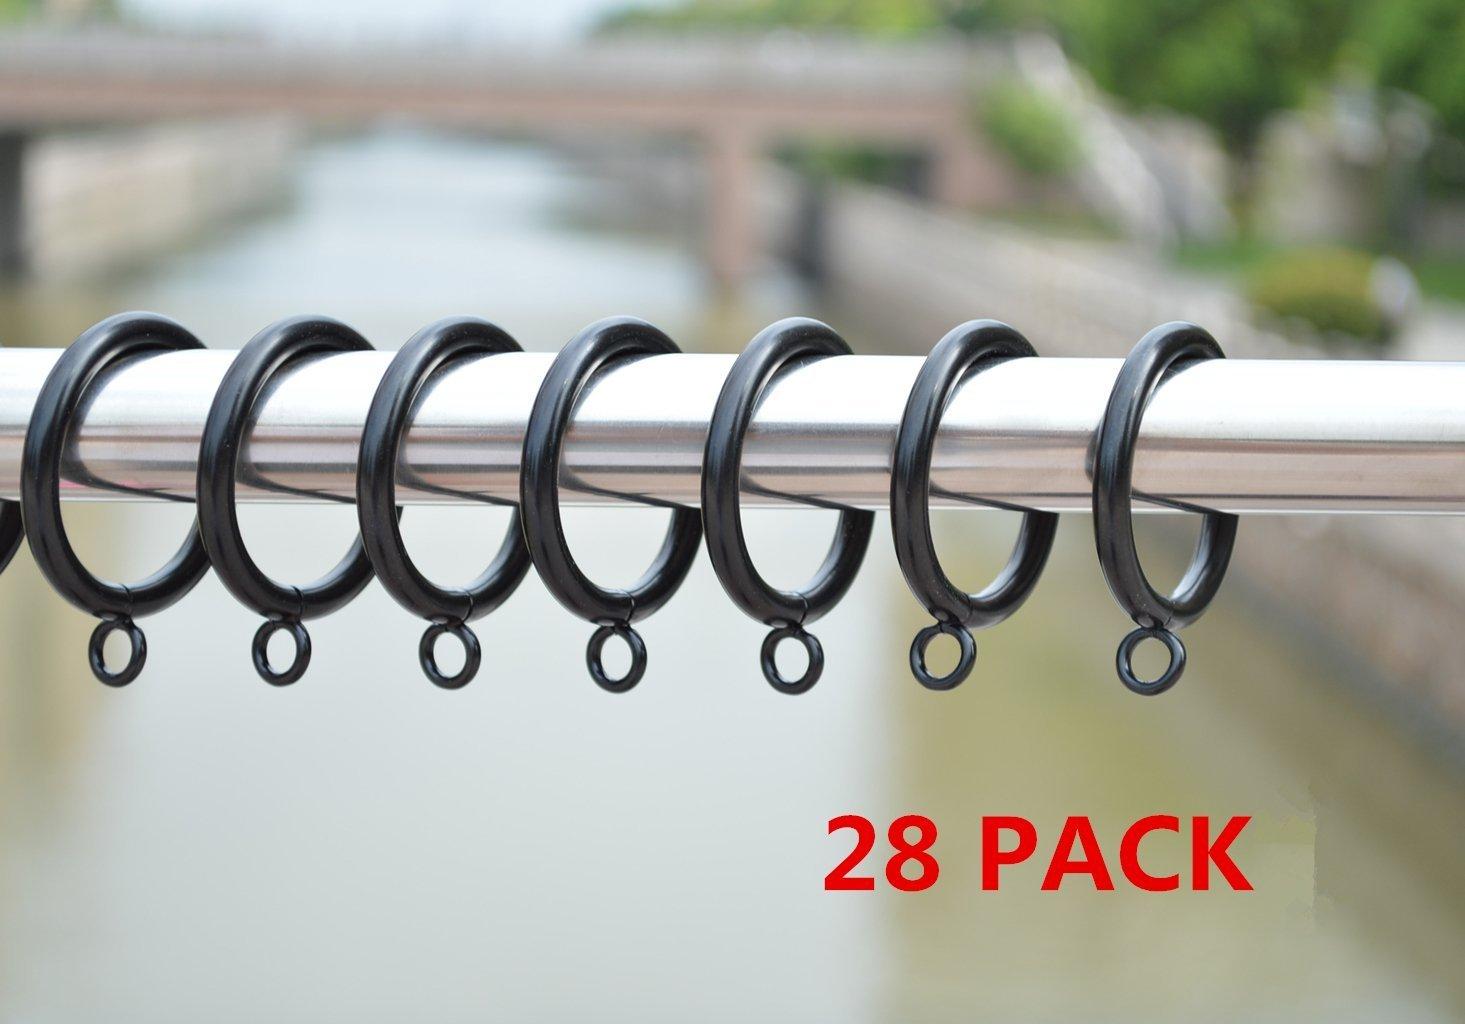 Jocon HD6038Q Pack of 28 Drapery Curtain Rings, Eyelet Rings, 1.5 Inch Inner Diameter (28, Black)